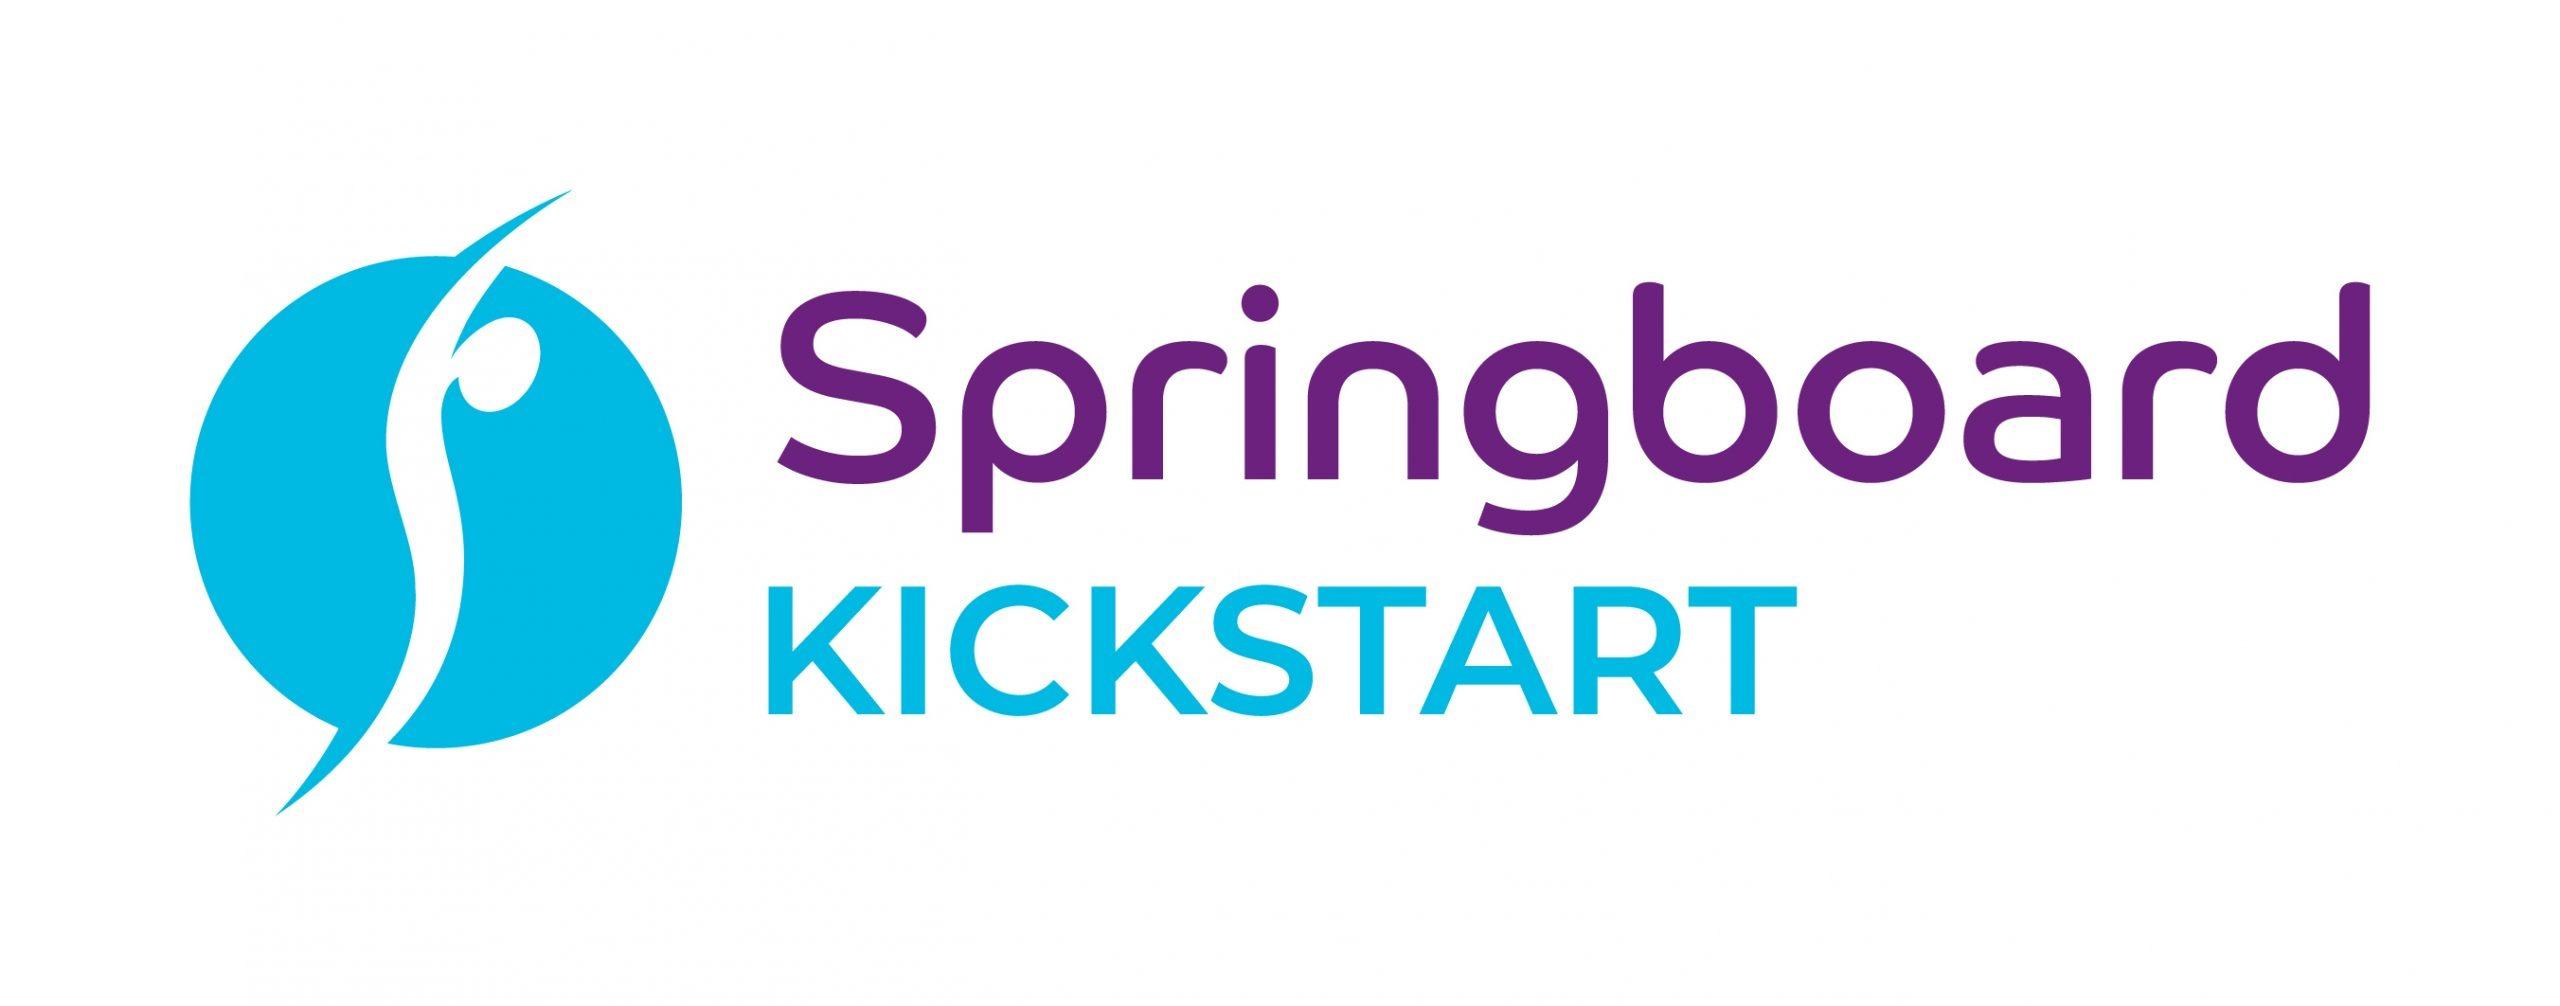 Springboard KickStart Logo